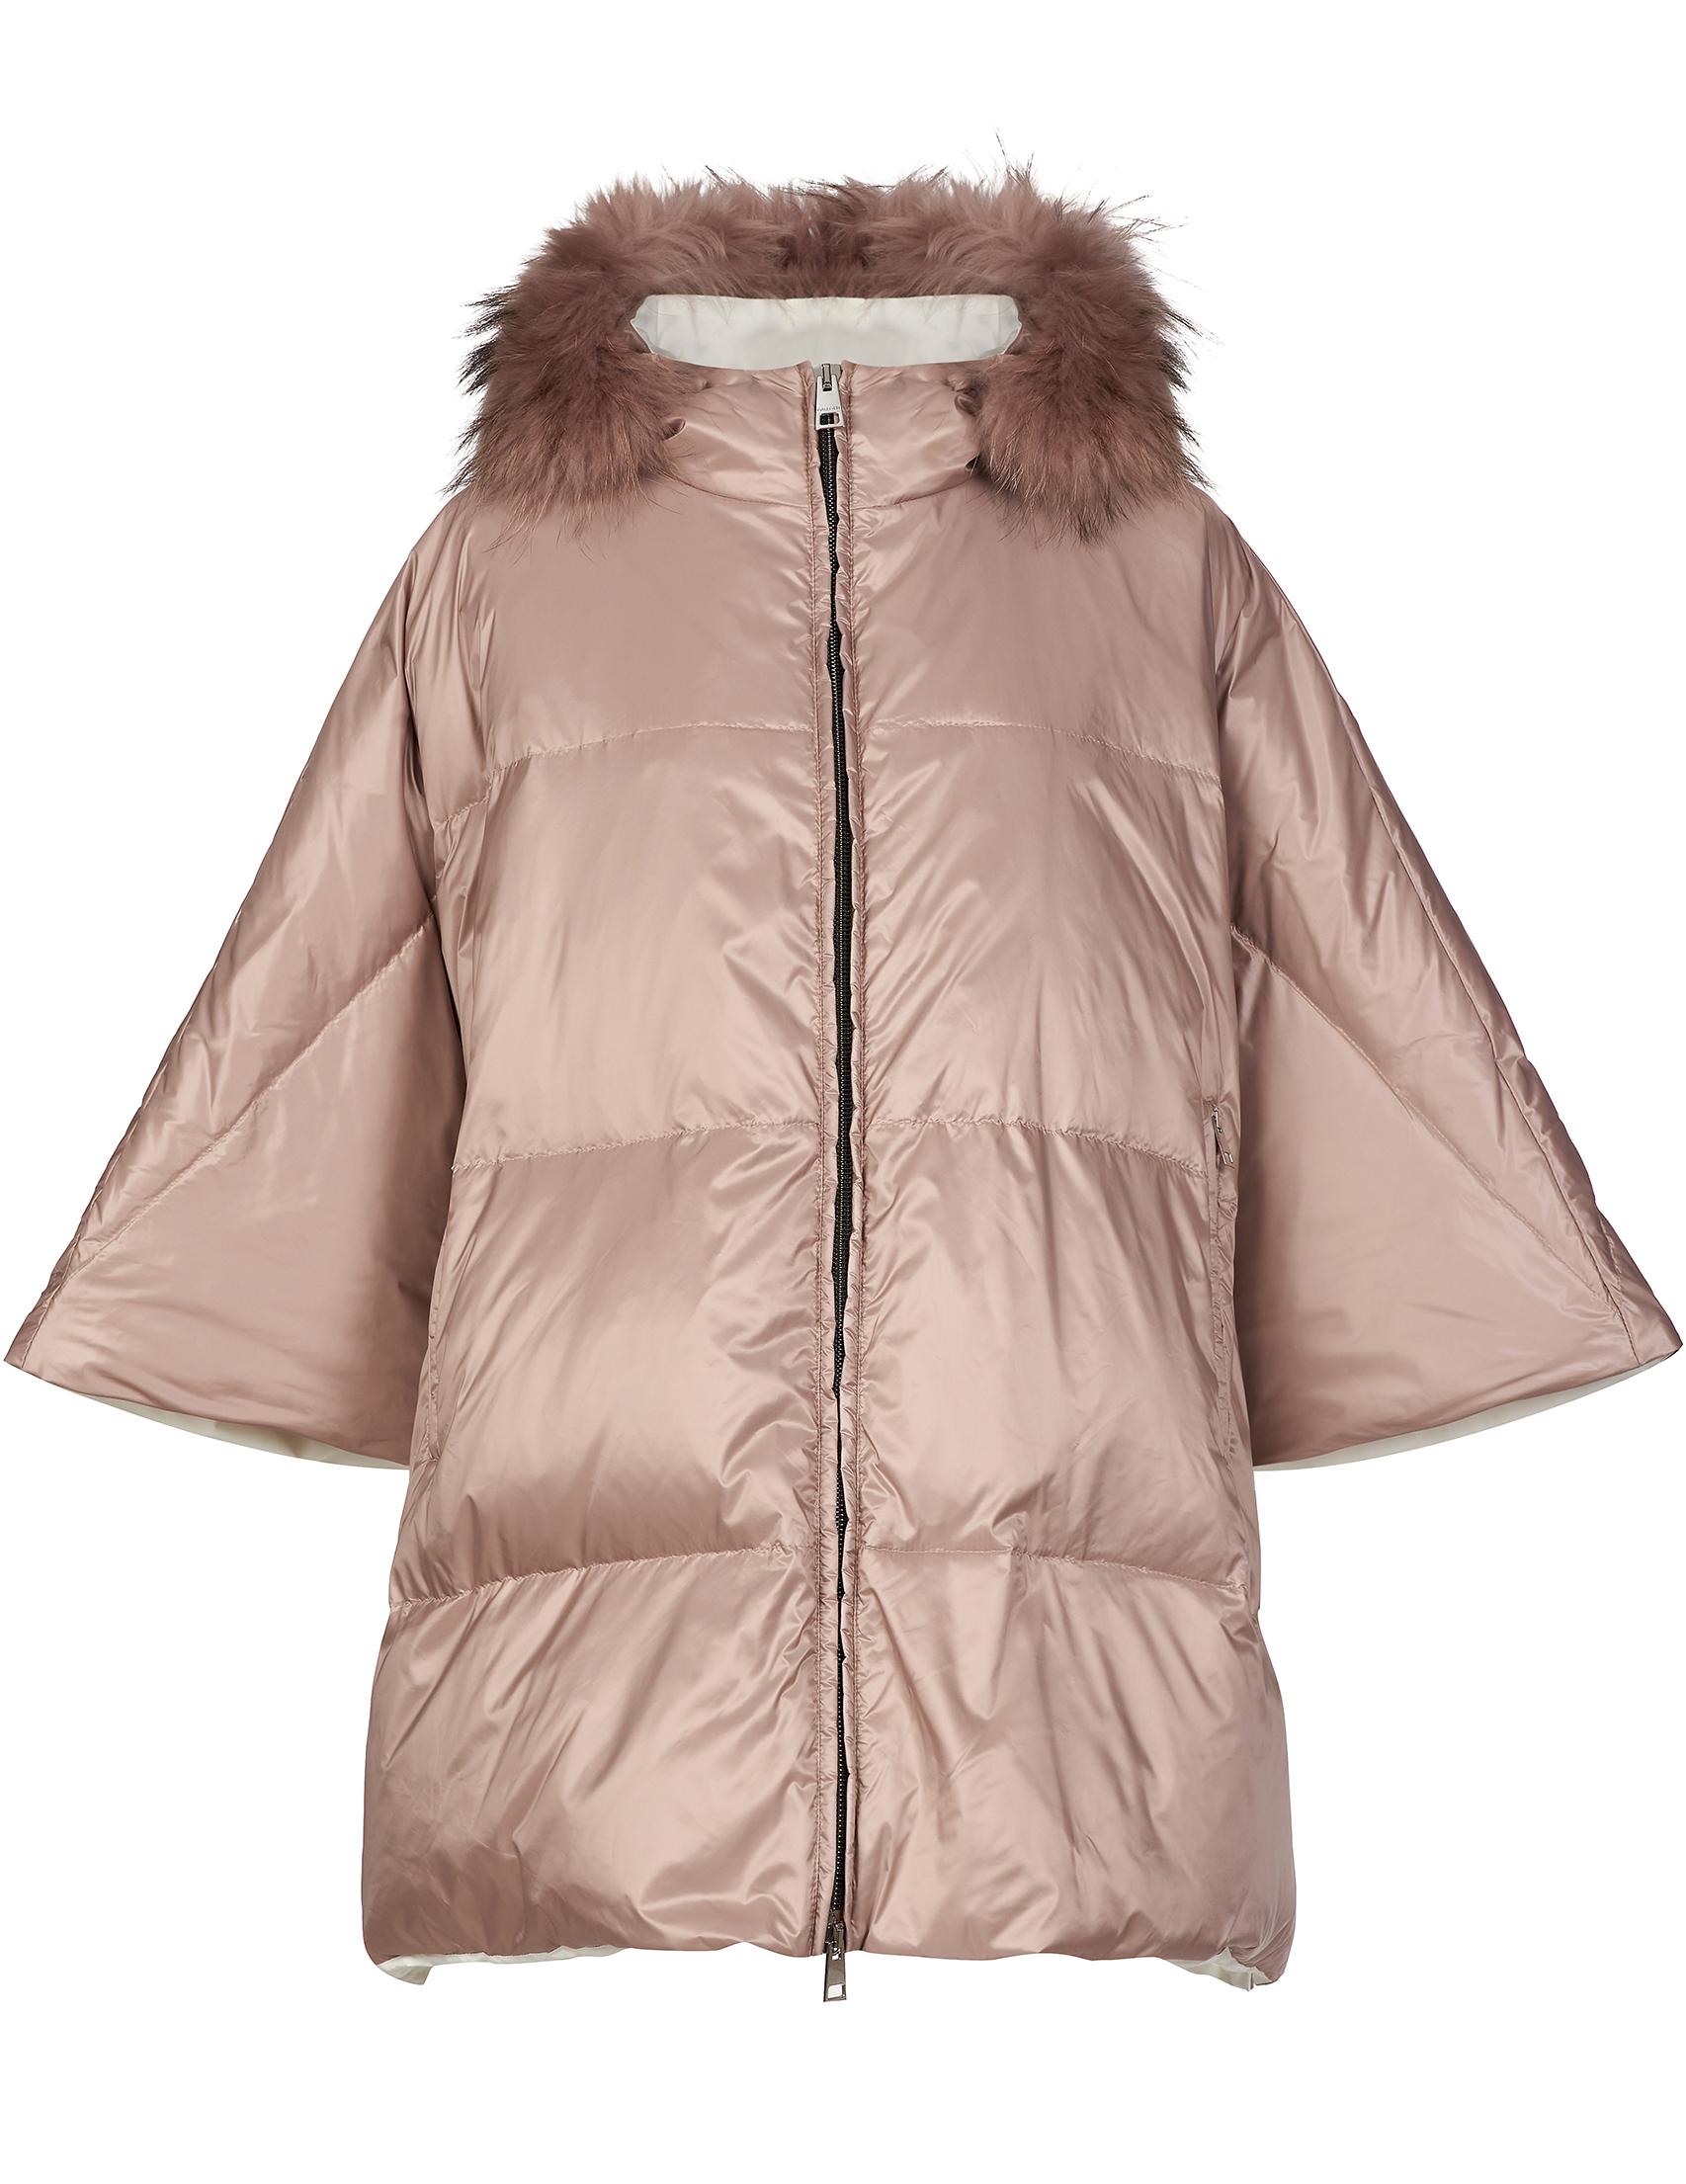 Купить Куртки, Куртка, GALLOTTI, Бежевый, 100%Полиамид;100%Полиэстер, Осень-Зима